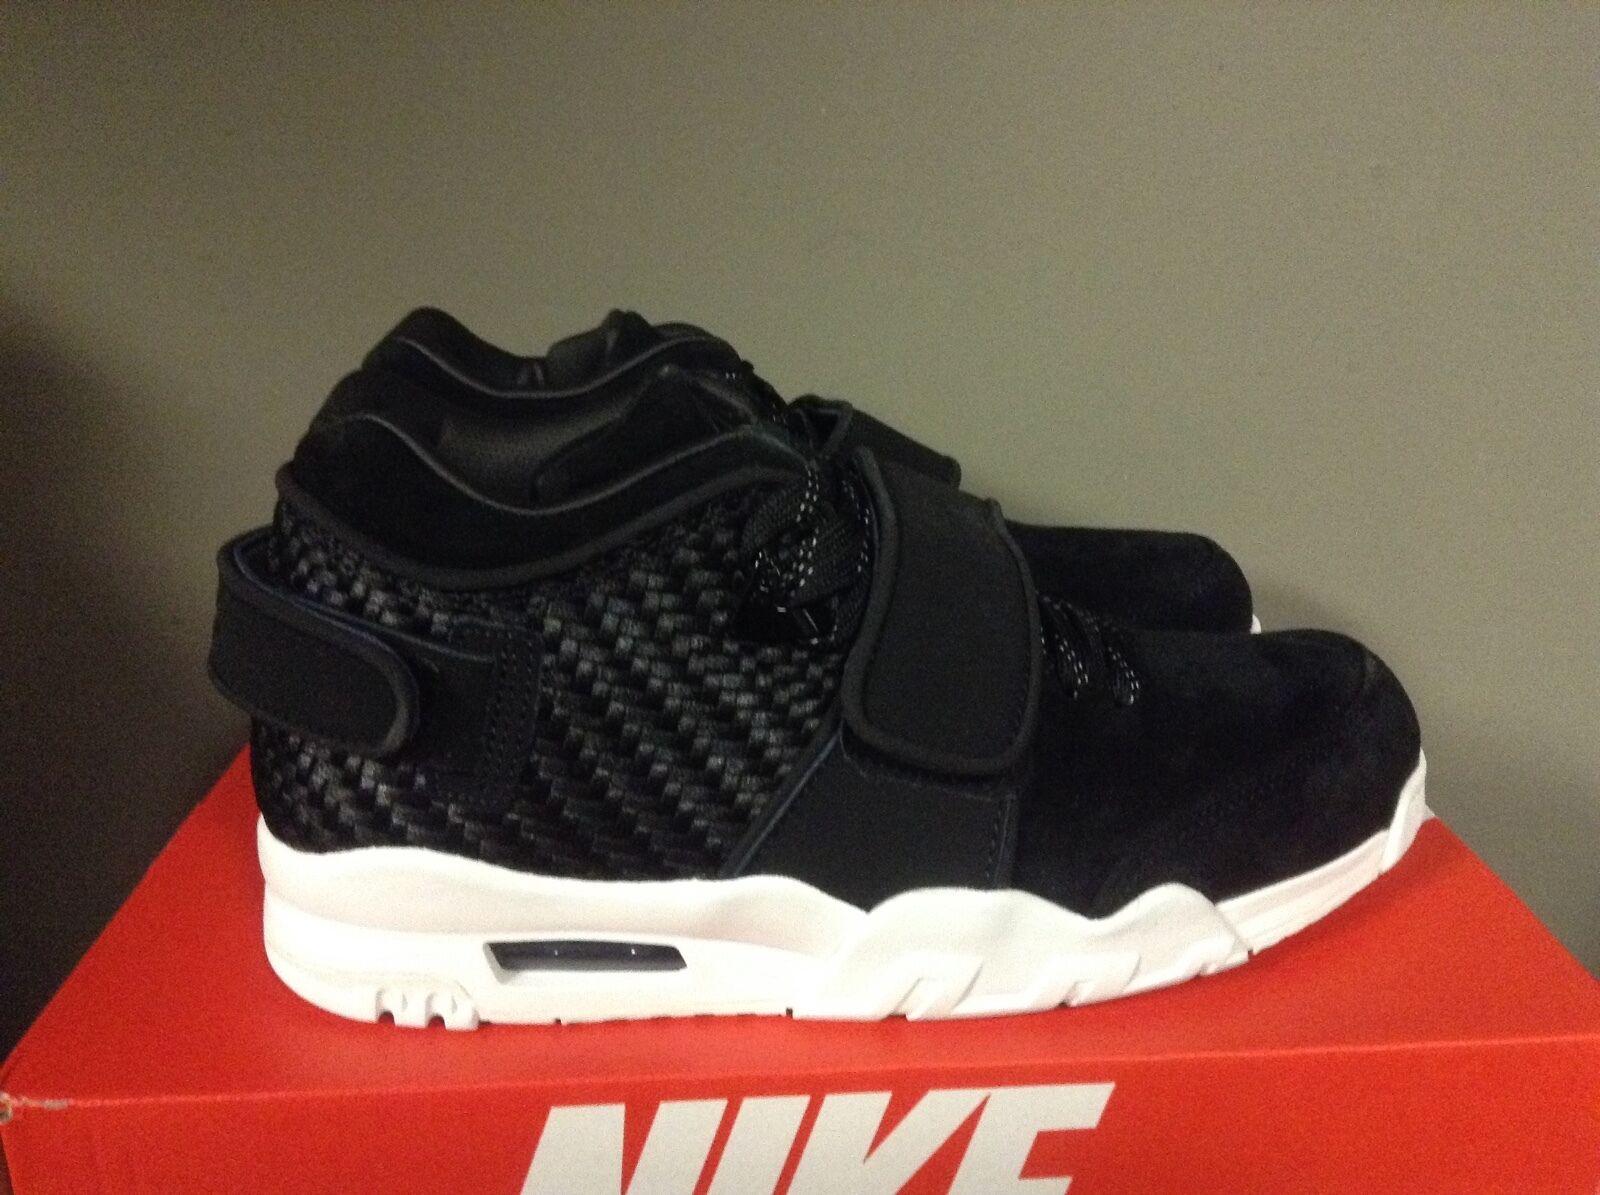 Nike air allenatore victor cruz bianco uomini 777535-004 nero / bianco cruz * nuove scarpe. 6c738a